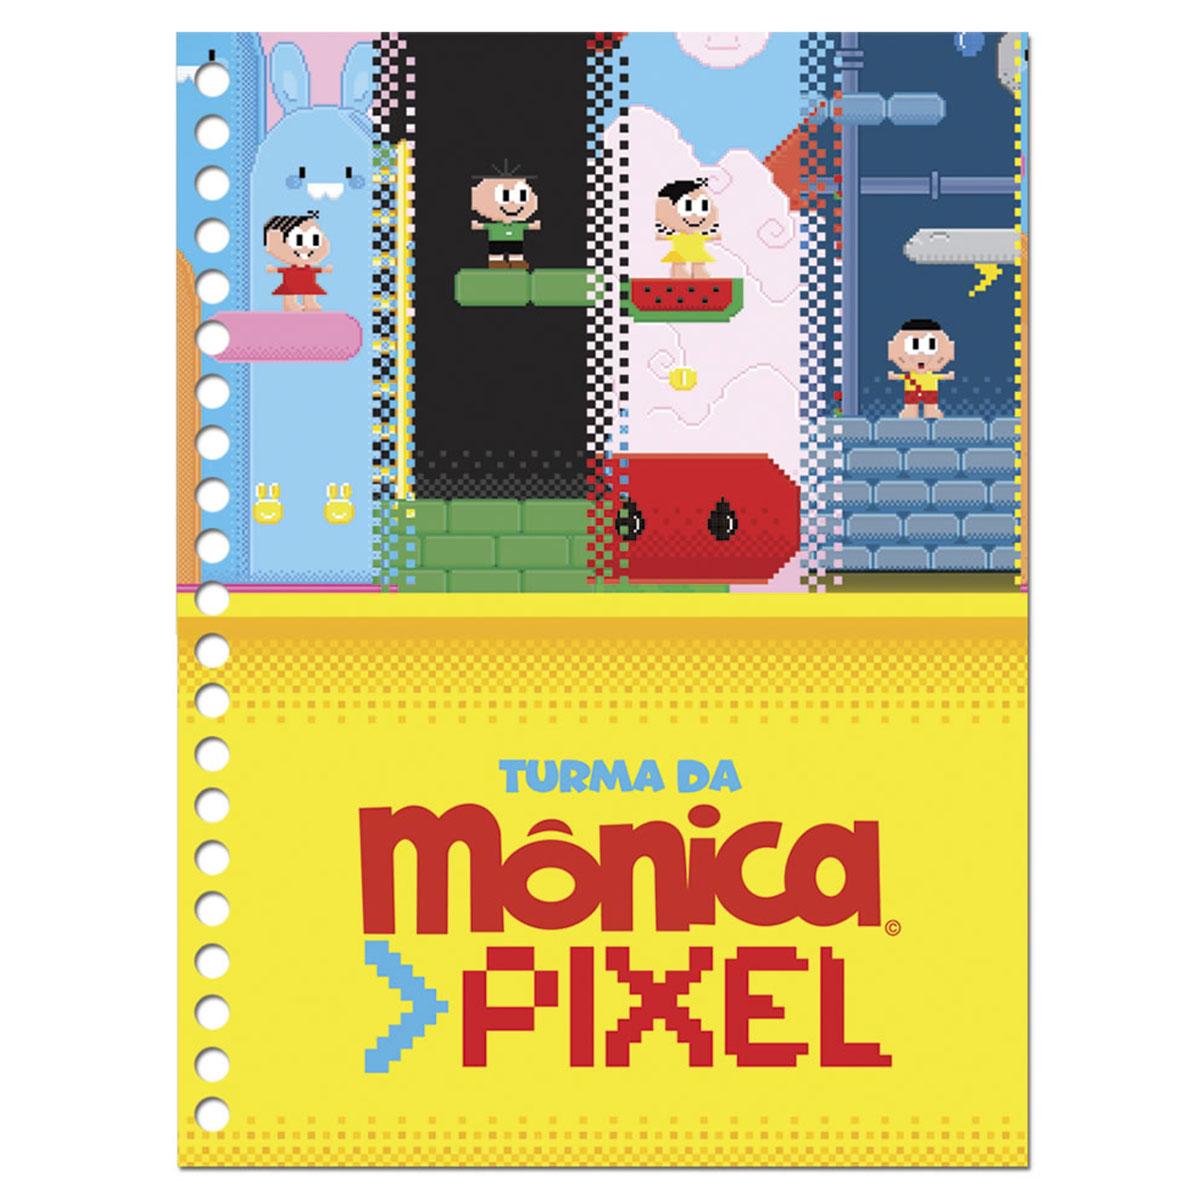 Agenda Diária 2016 Turma da Mônica Pixel Mônica